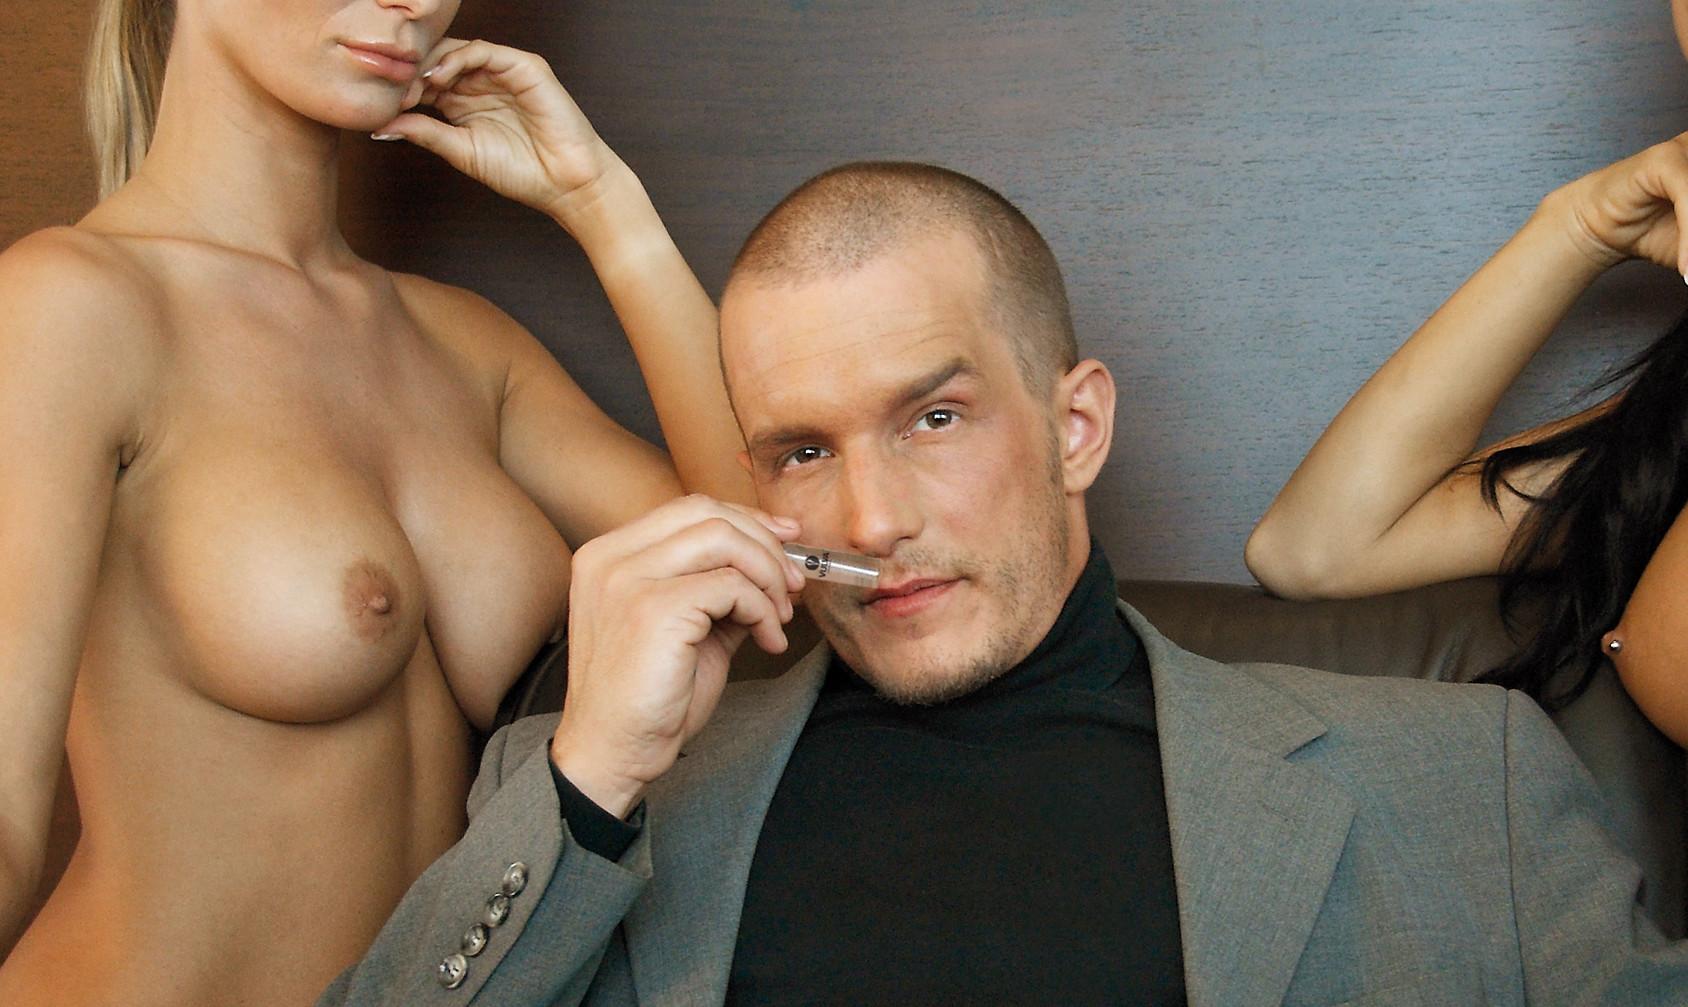 Kopfkino_cuckolding_Erotischer Duft_Aphrodisiakum | VULVA Original